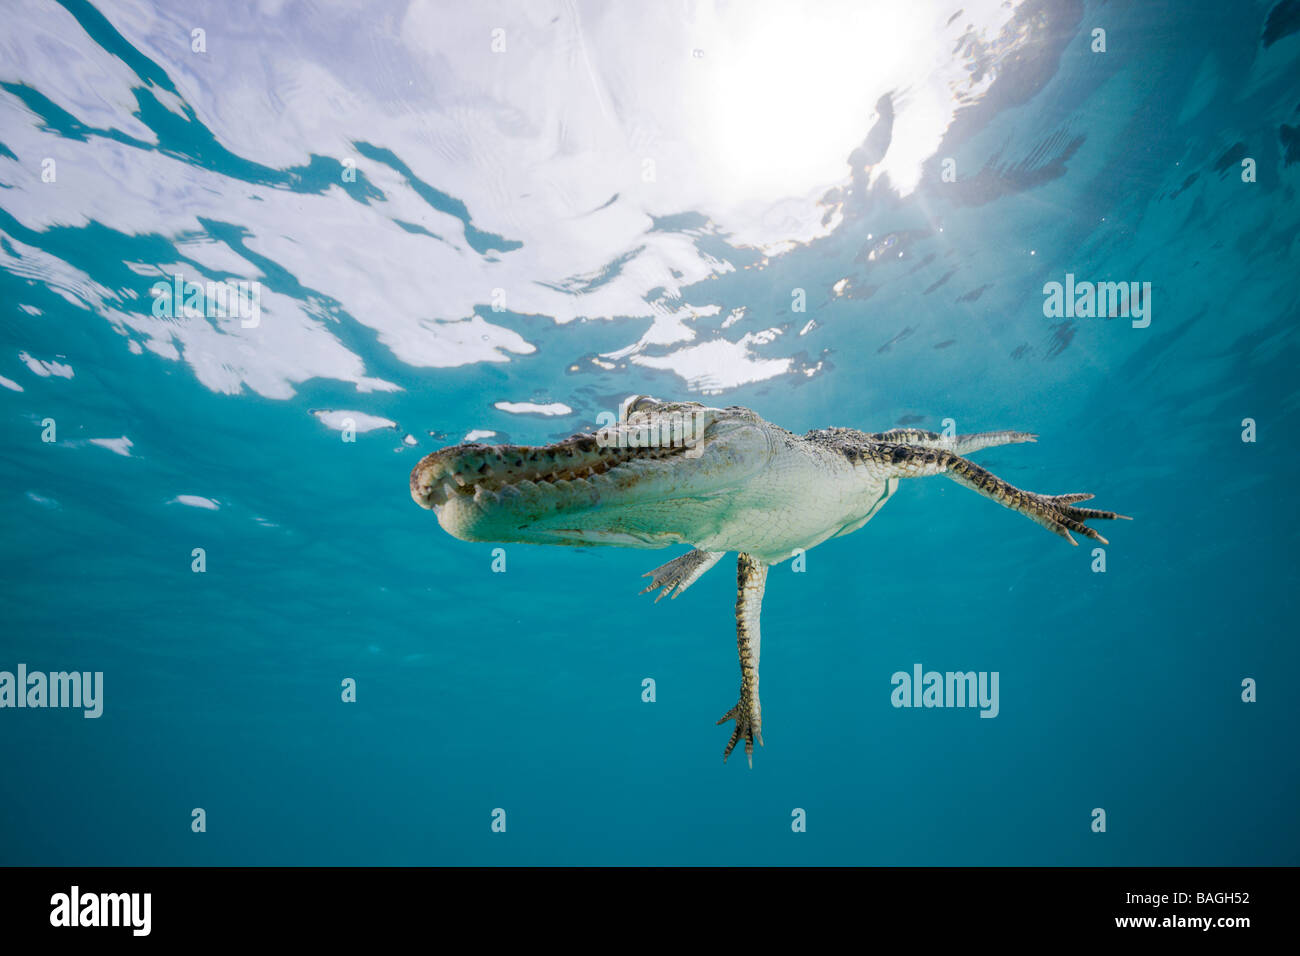 Saltwater Crocodile Crocodylus porosus Micronesia Palau - Stock Image